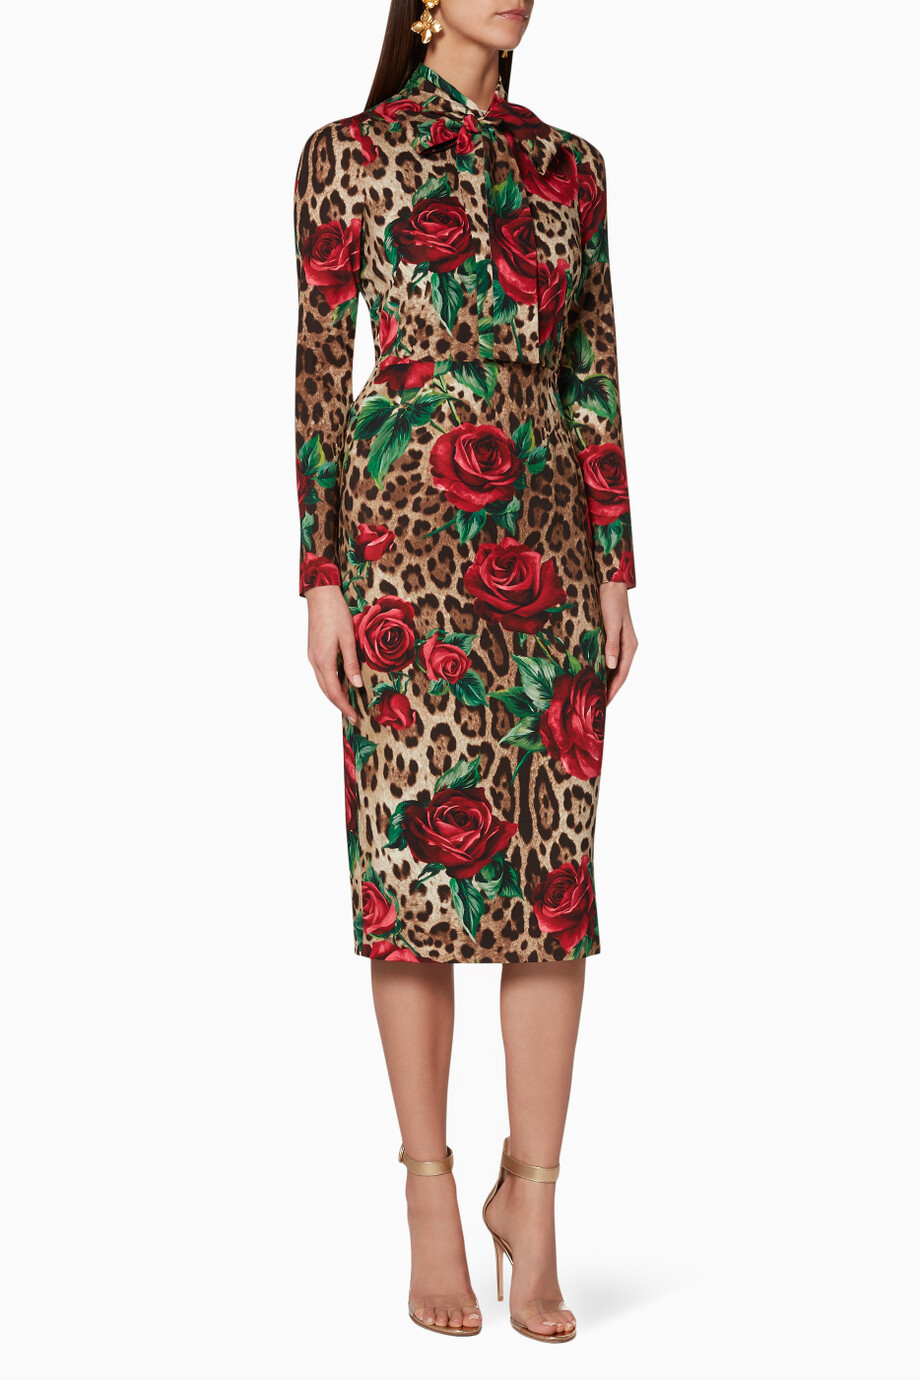 c5a7a923f632 Shop Dolce & Gabbana Brown Leopard & Rose-Print Silk Midi Dress for ...